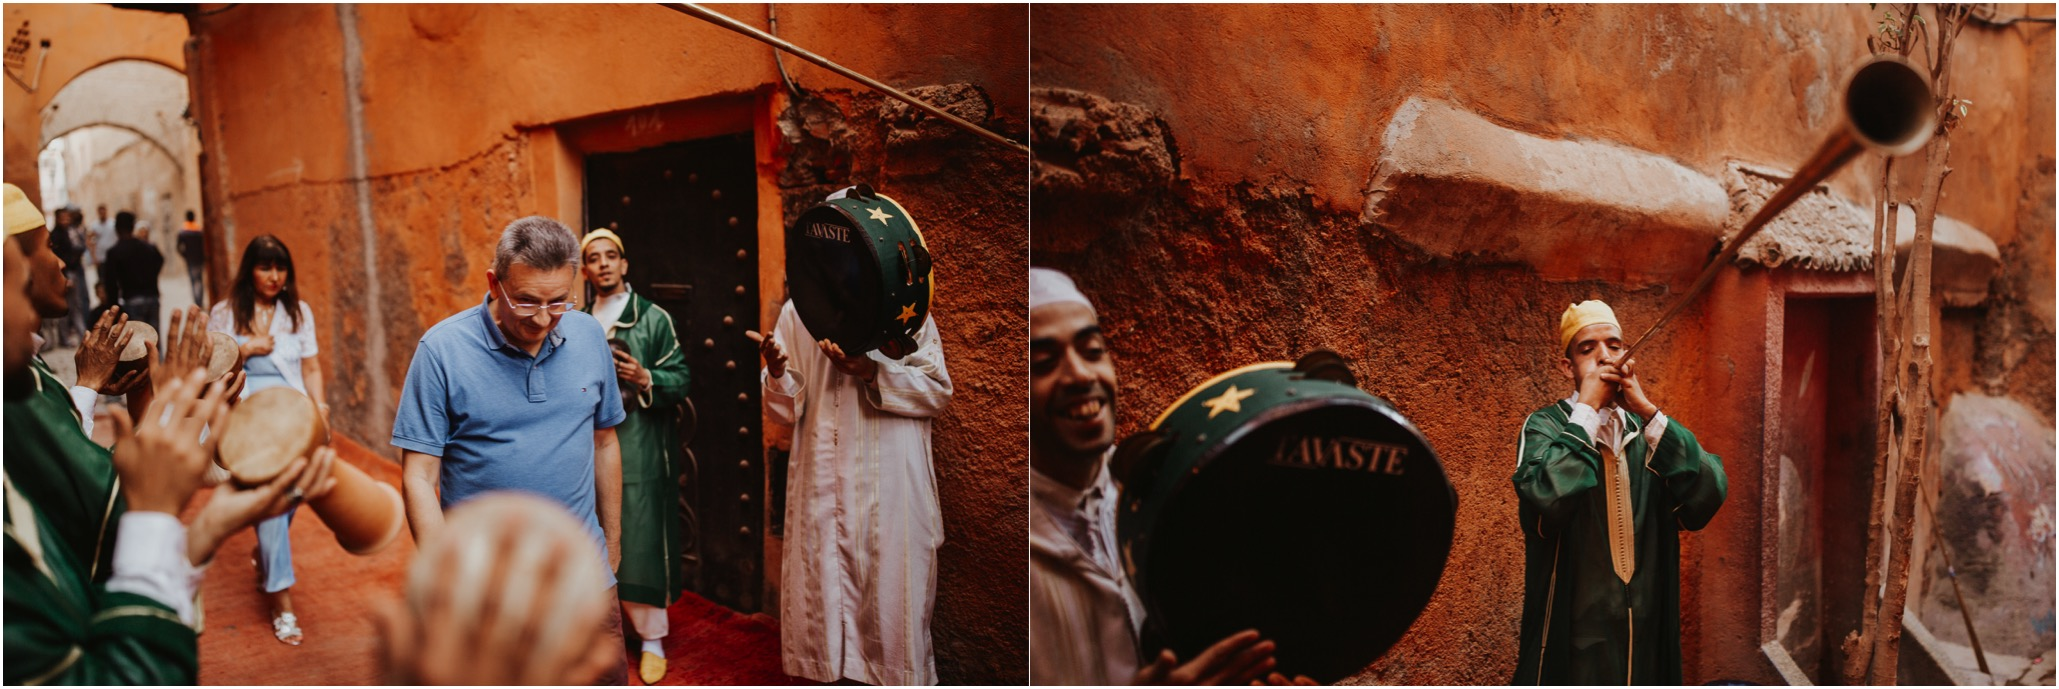 Morocco Wedding0008.jpg